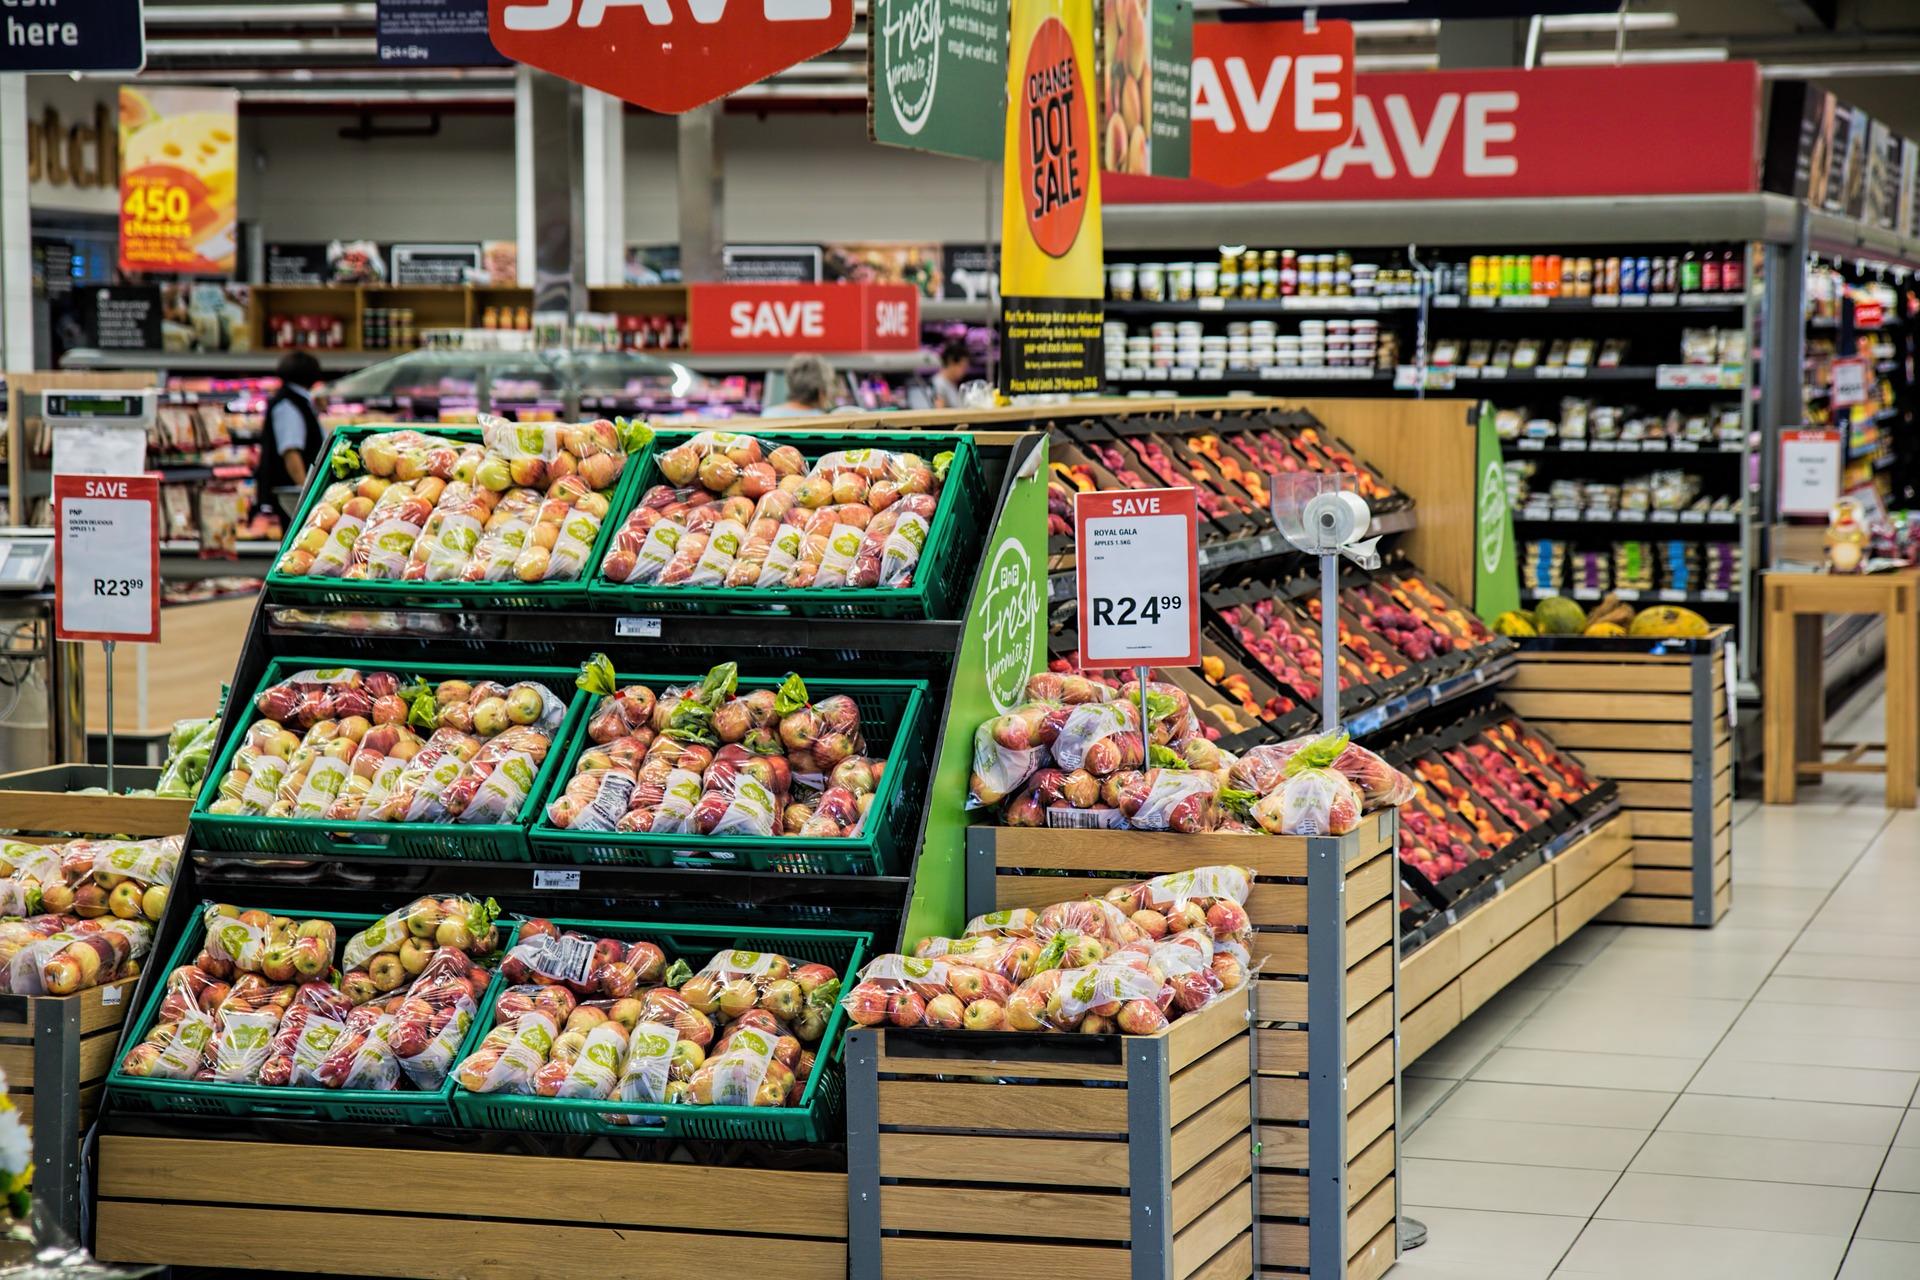 shopping-1232944_1920